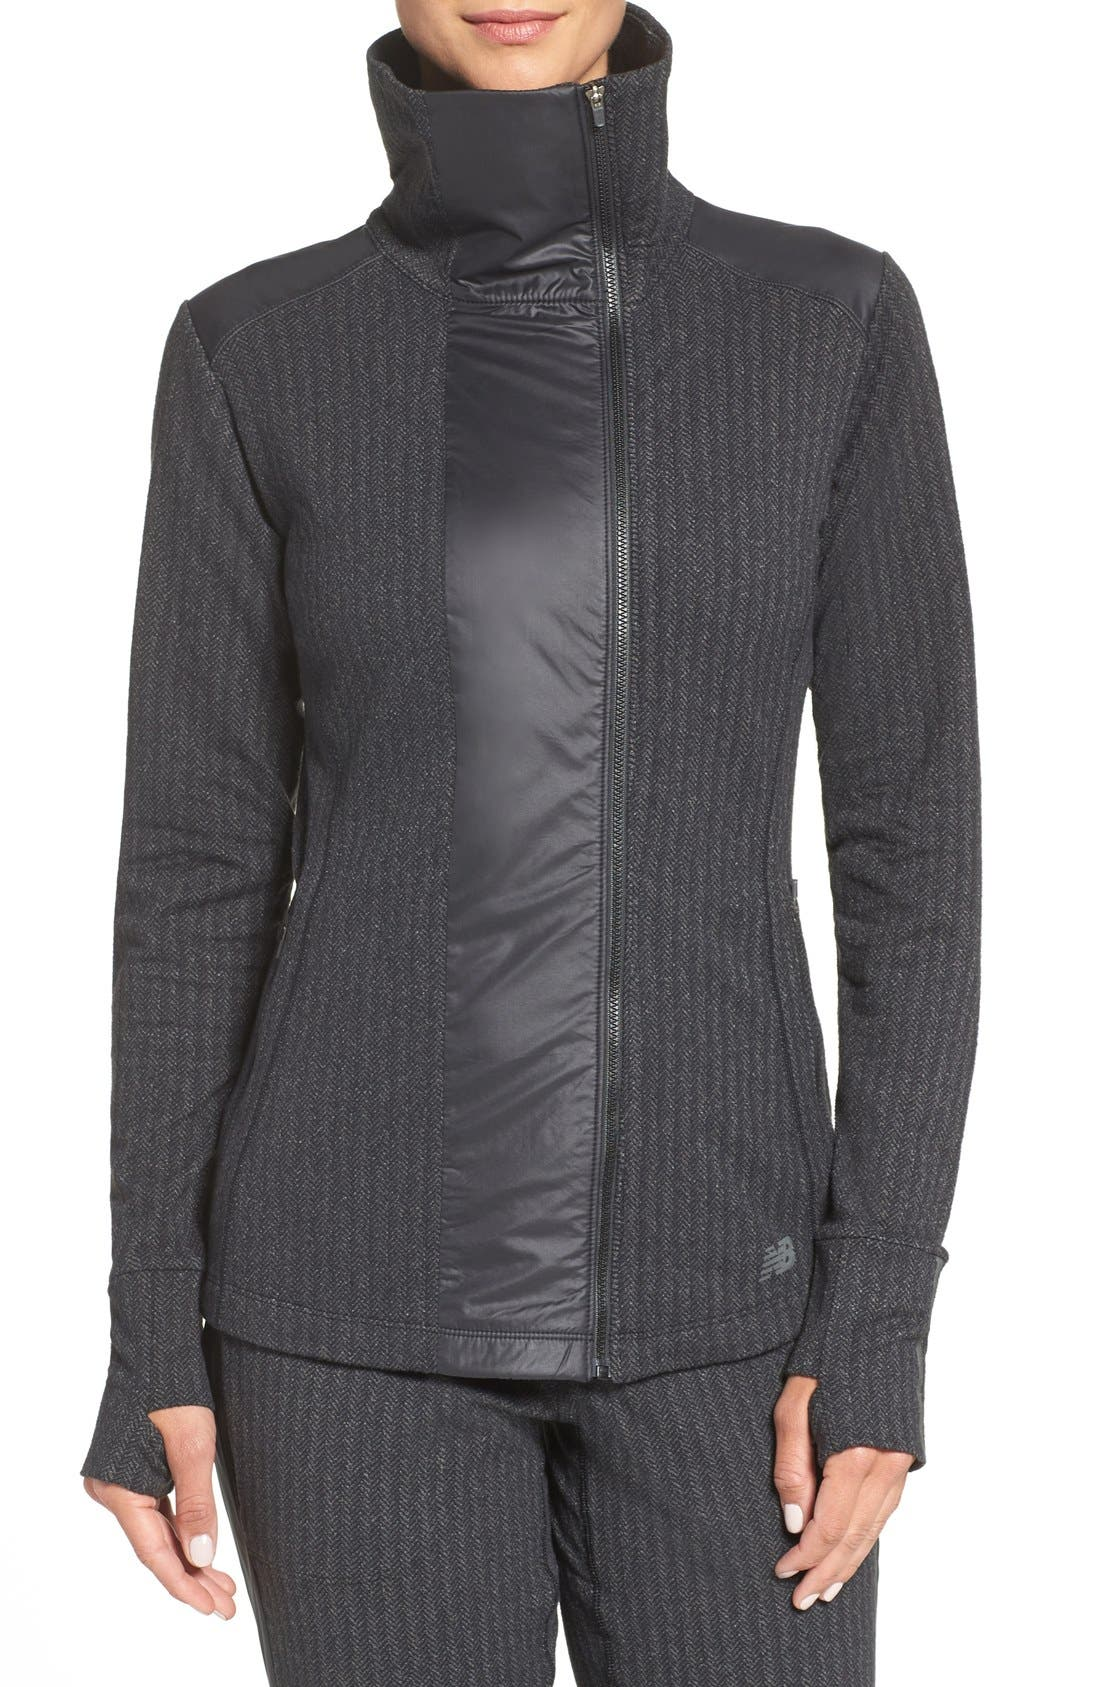 'Heat' Mock Neck Jacket,                         Main,                         color, Black